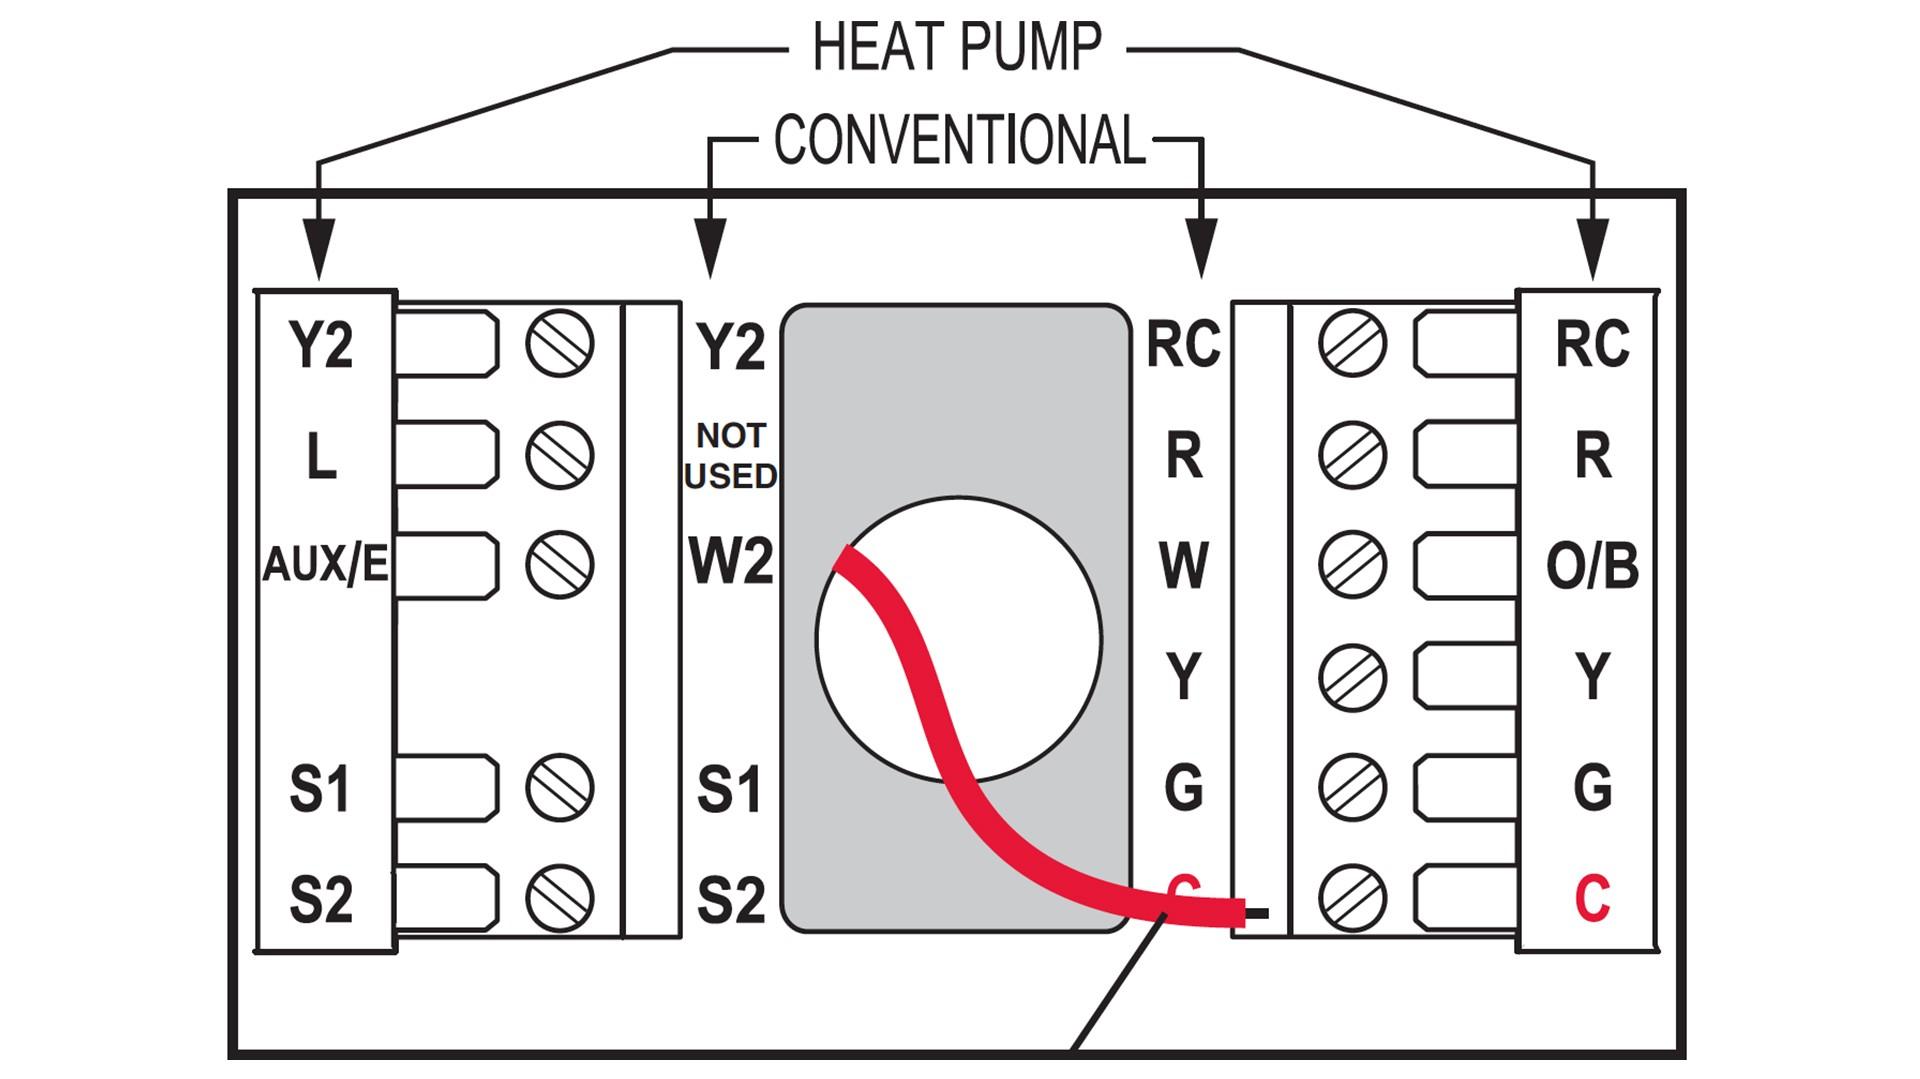 honeywell thermostat wiring instructions diy house help rh diyhousehelp